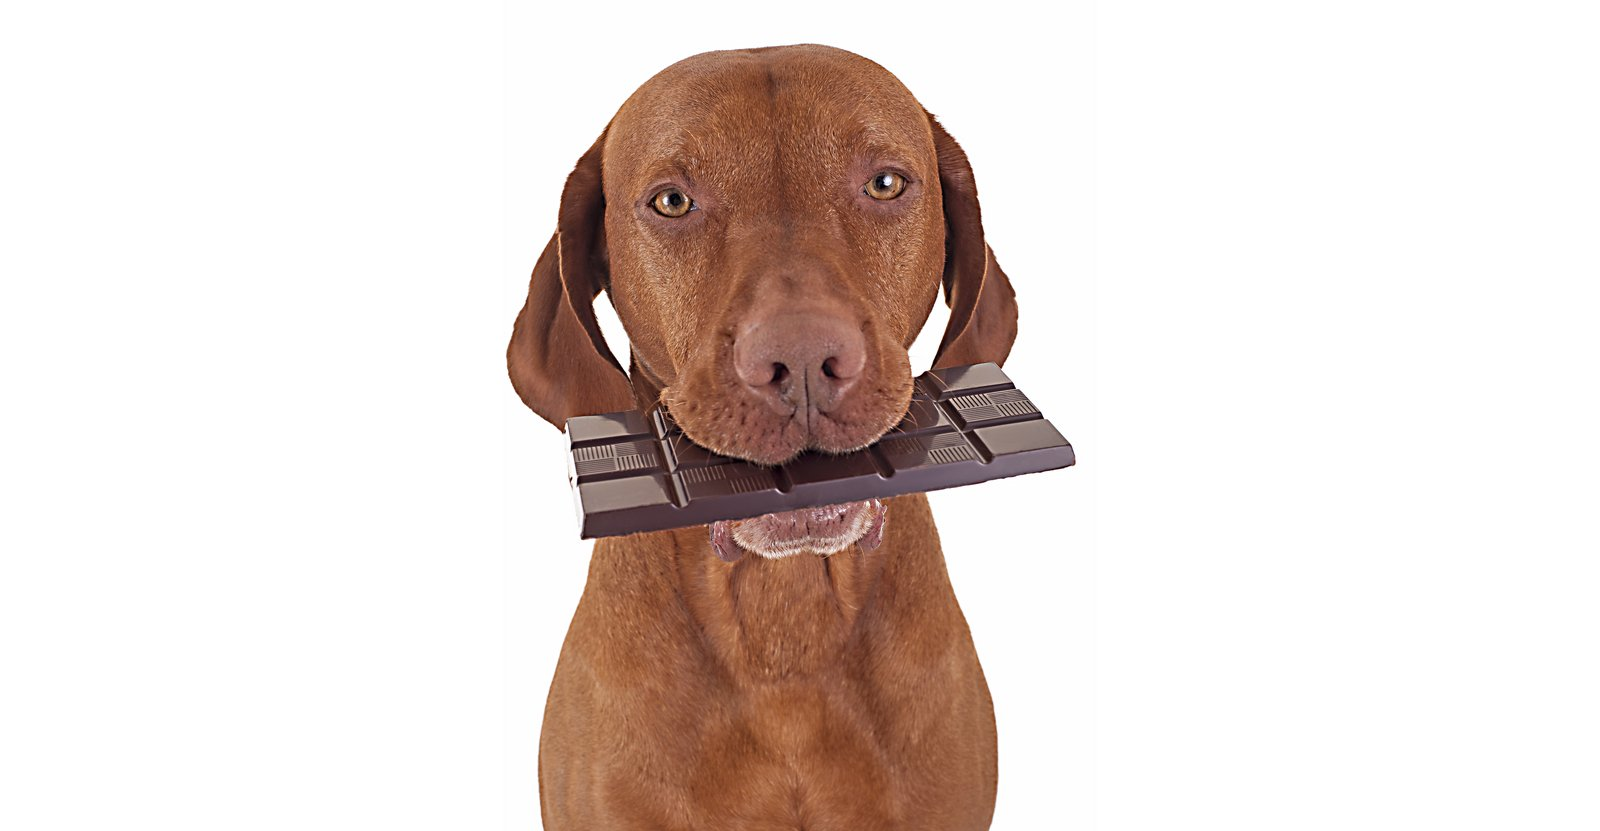 Dog with chocolate bar